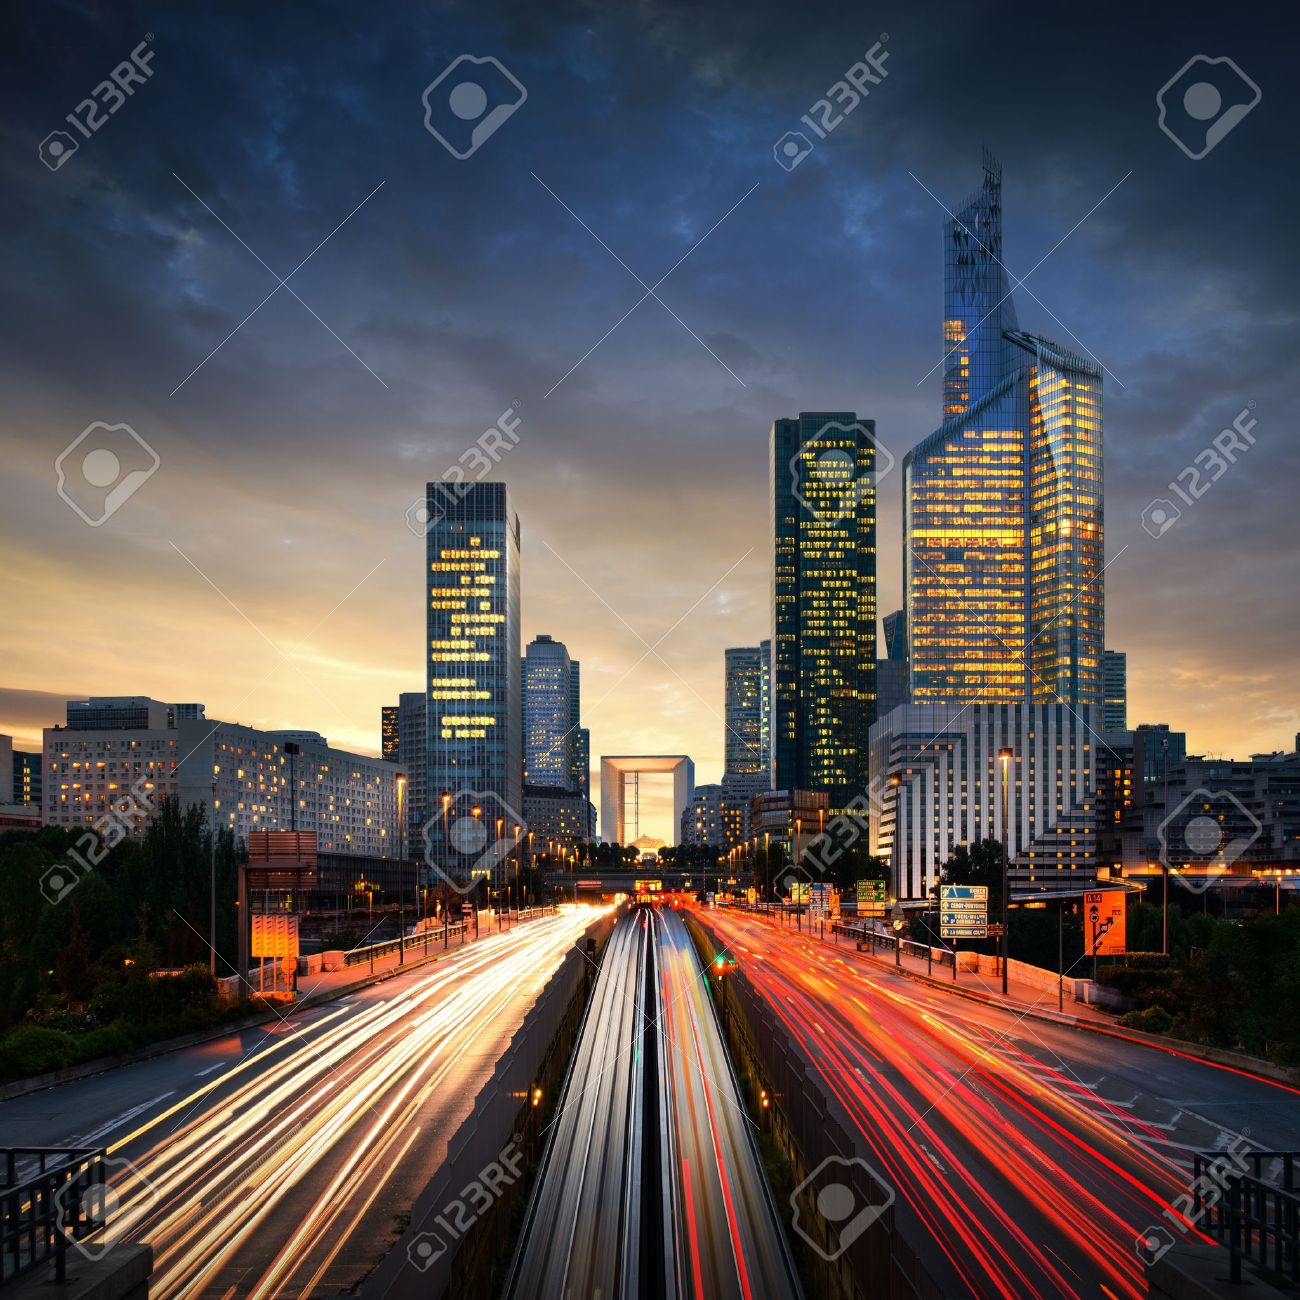 Paris LaDefense at sunset - La Defense - 26115779